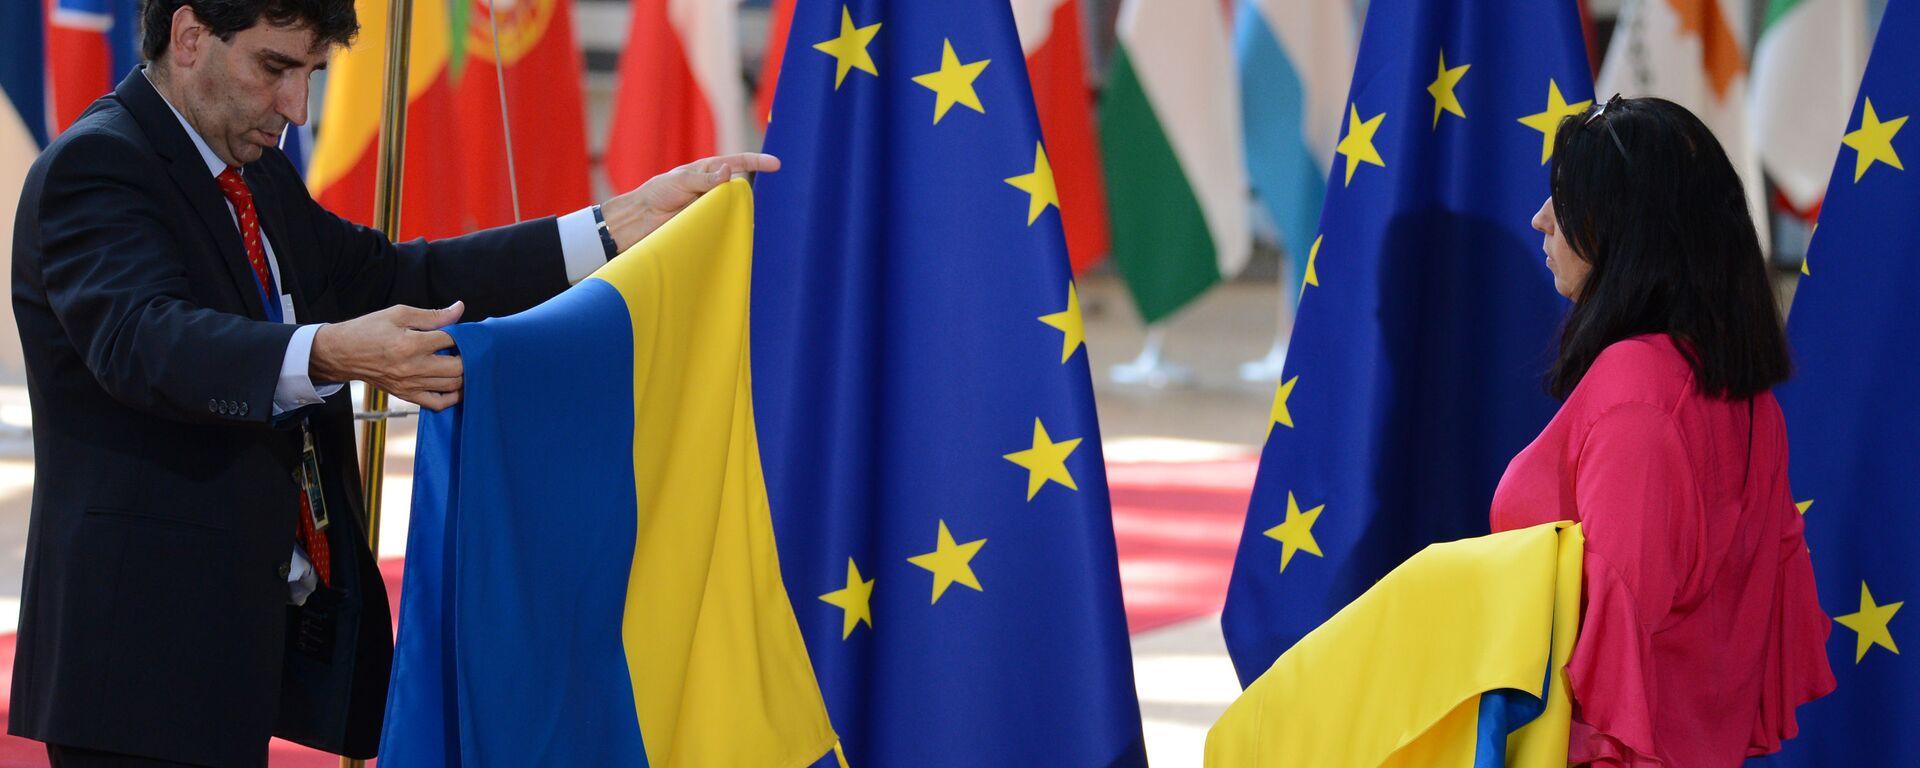 Flagi UE i Ukrainy - Sputnik Polska, 1920, 11.09.2021